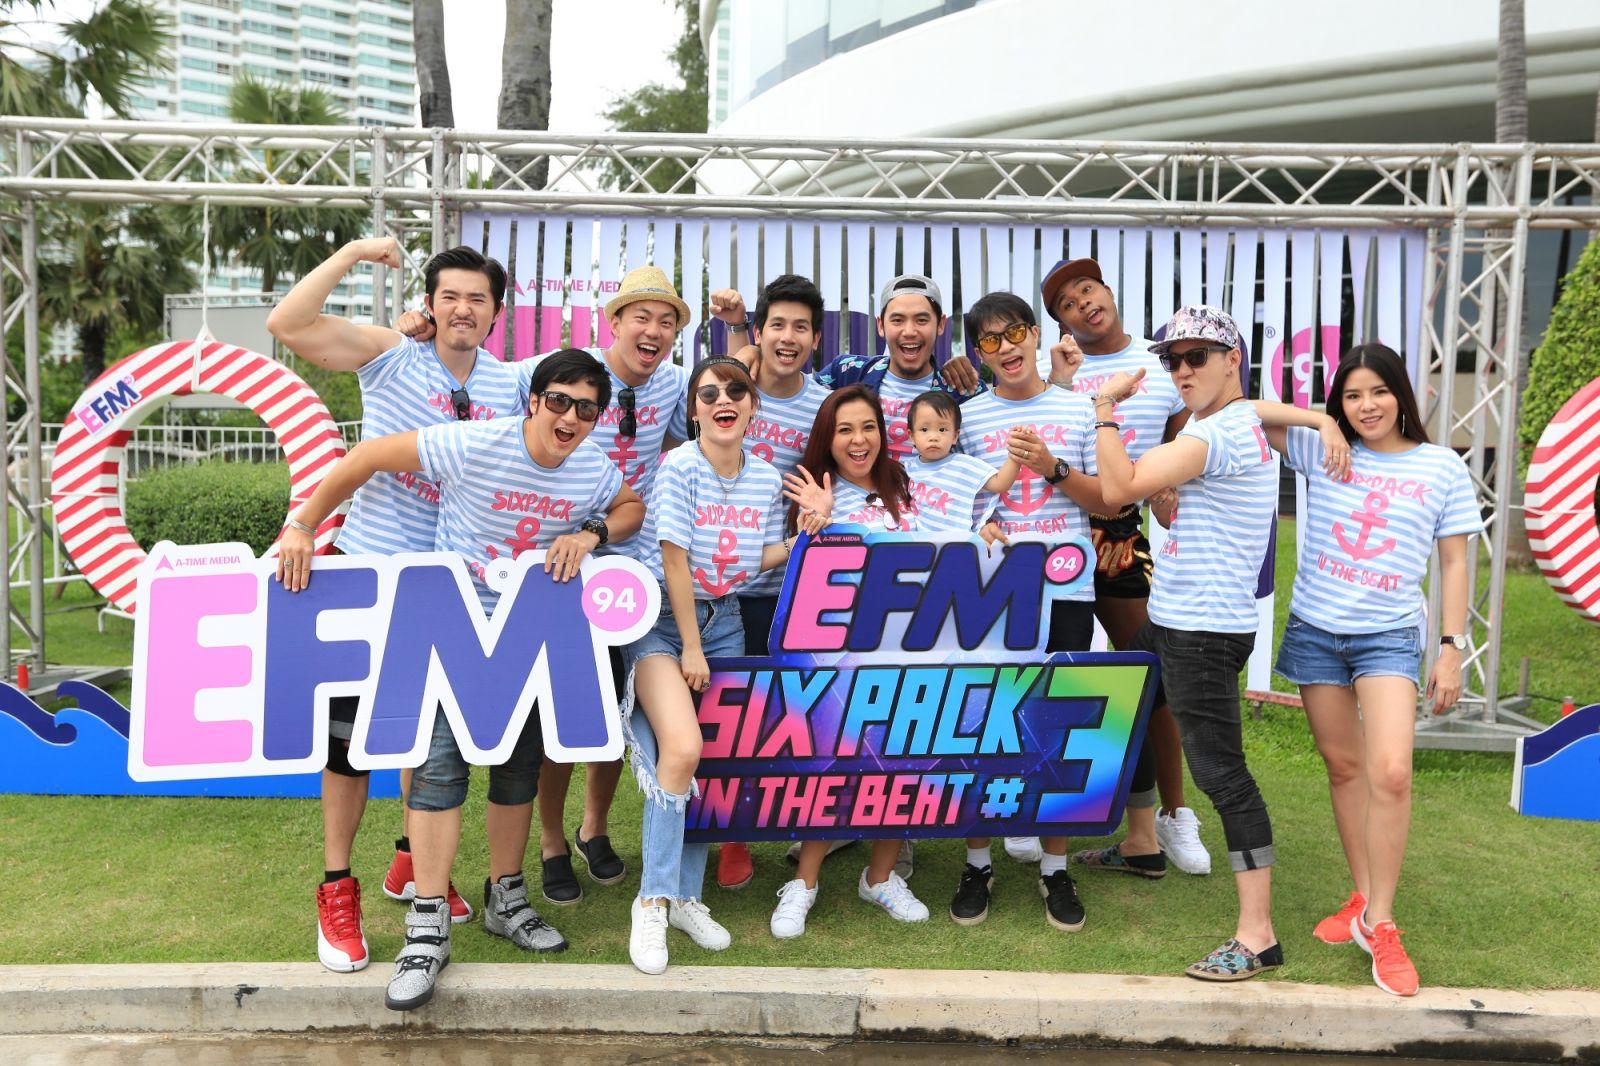 EFM Six Pack on The Beat  มันยกกำลัง3 แฟนทะลัก ยกแพ็ค บันเทิง งานดนตรี